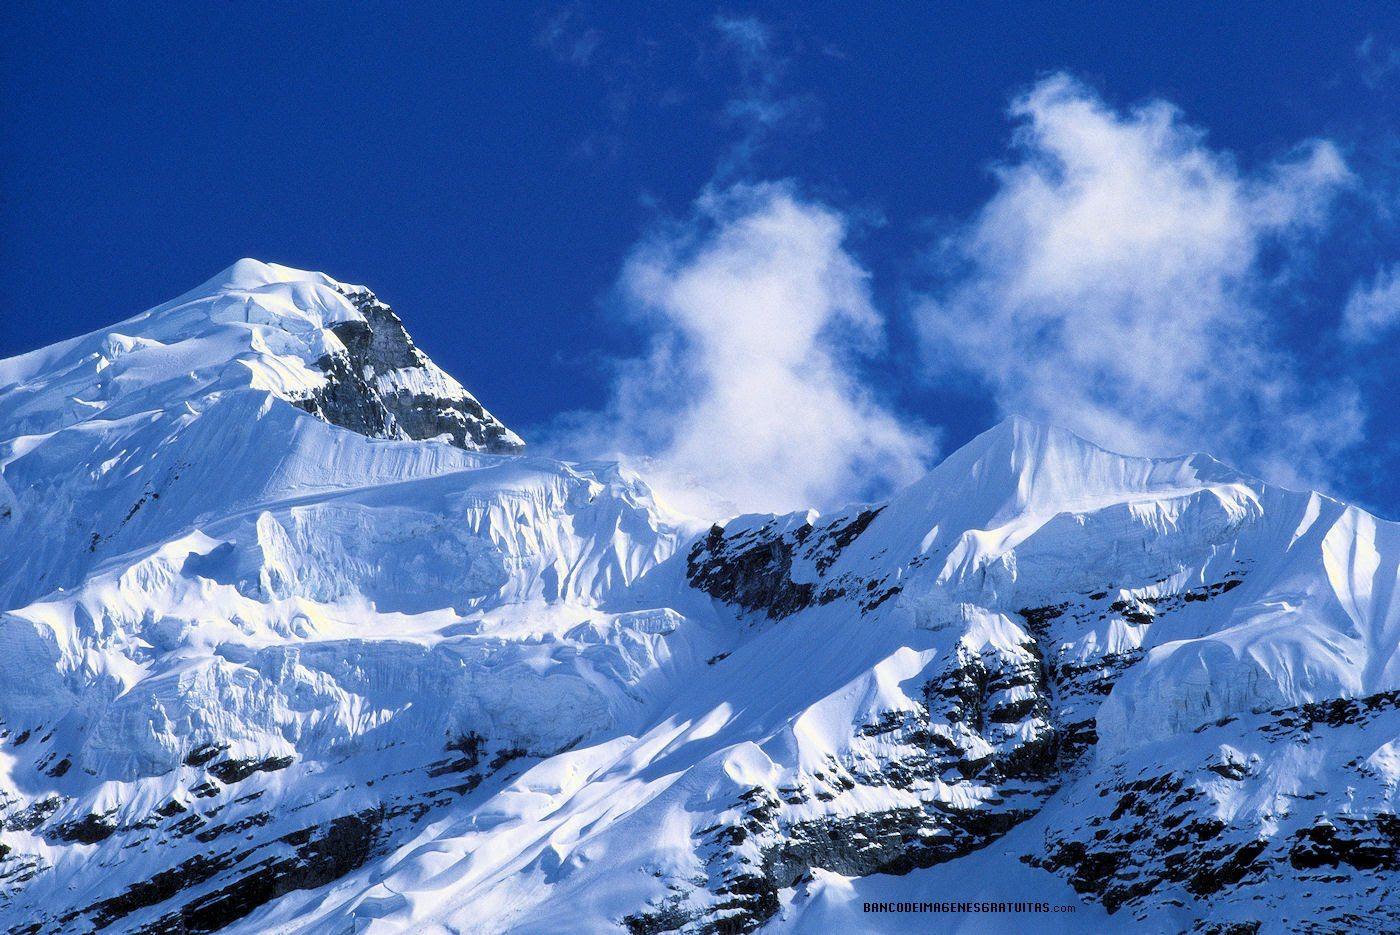 Una Montaña Nevada: Paisajes Nevados O Snowscapes